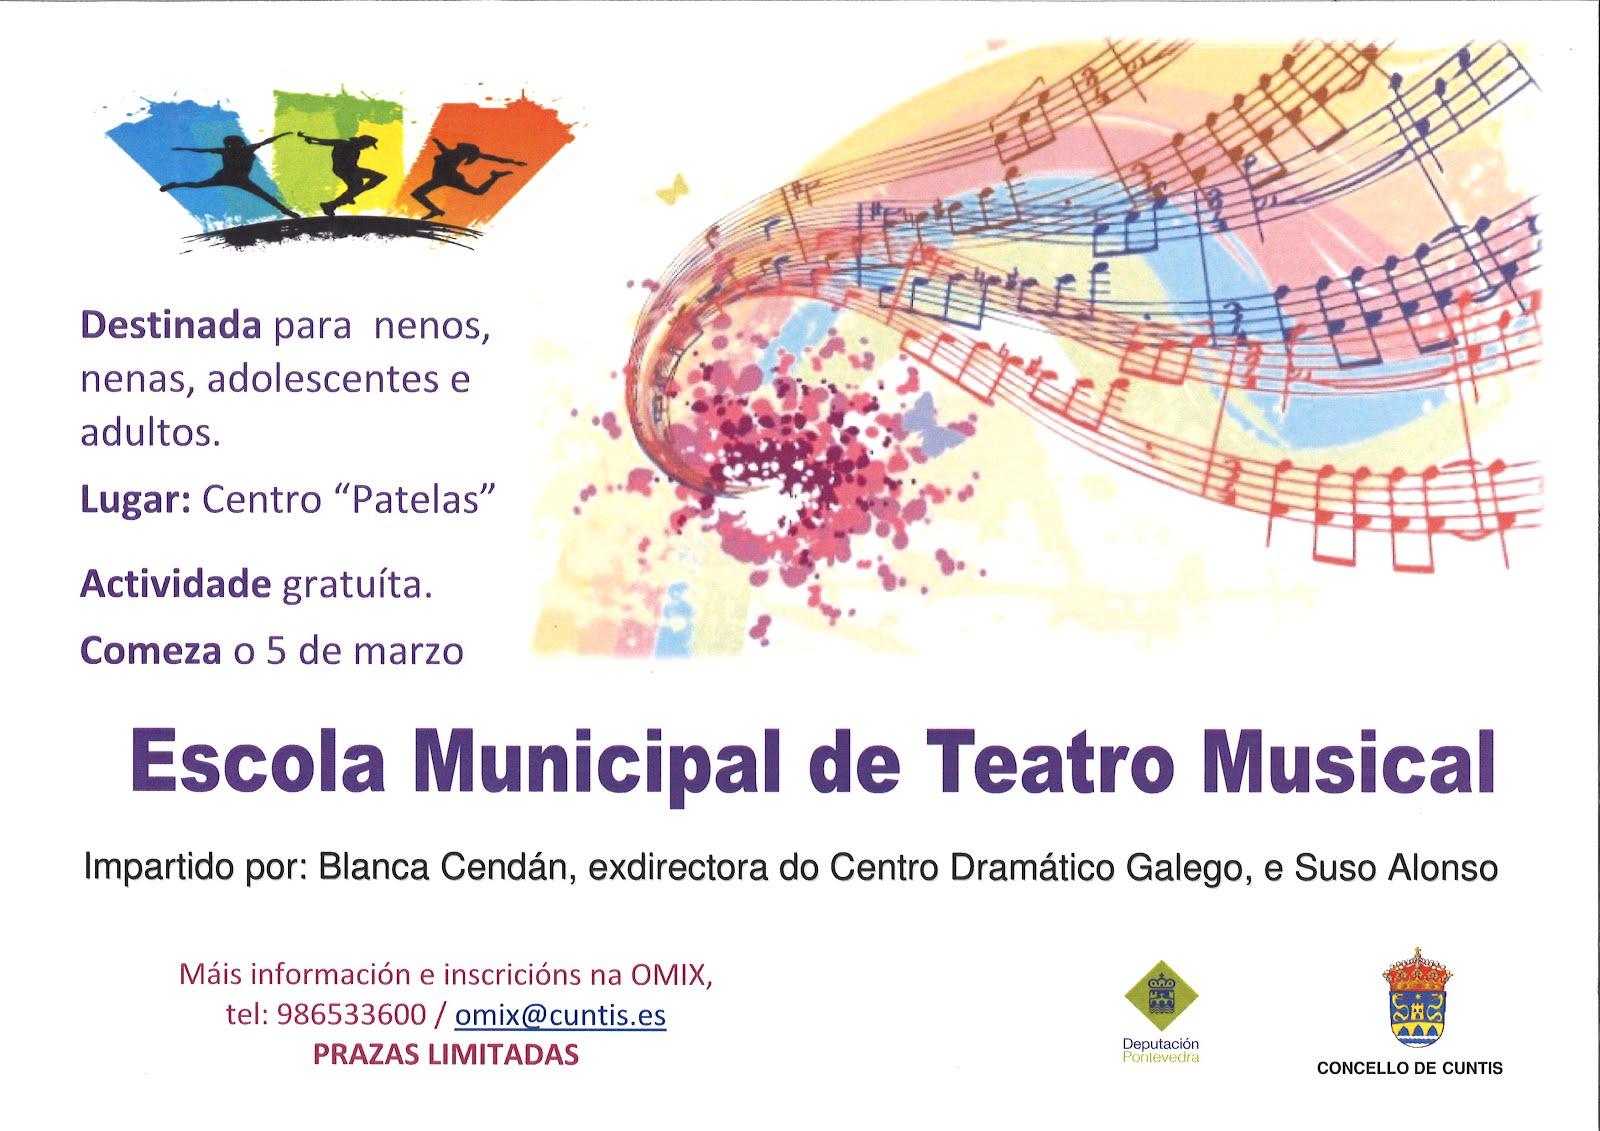 ESCOLA MUNICIPAL DE TEATRO MUSICAL